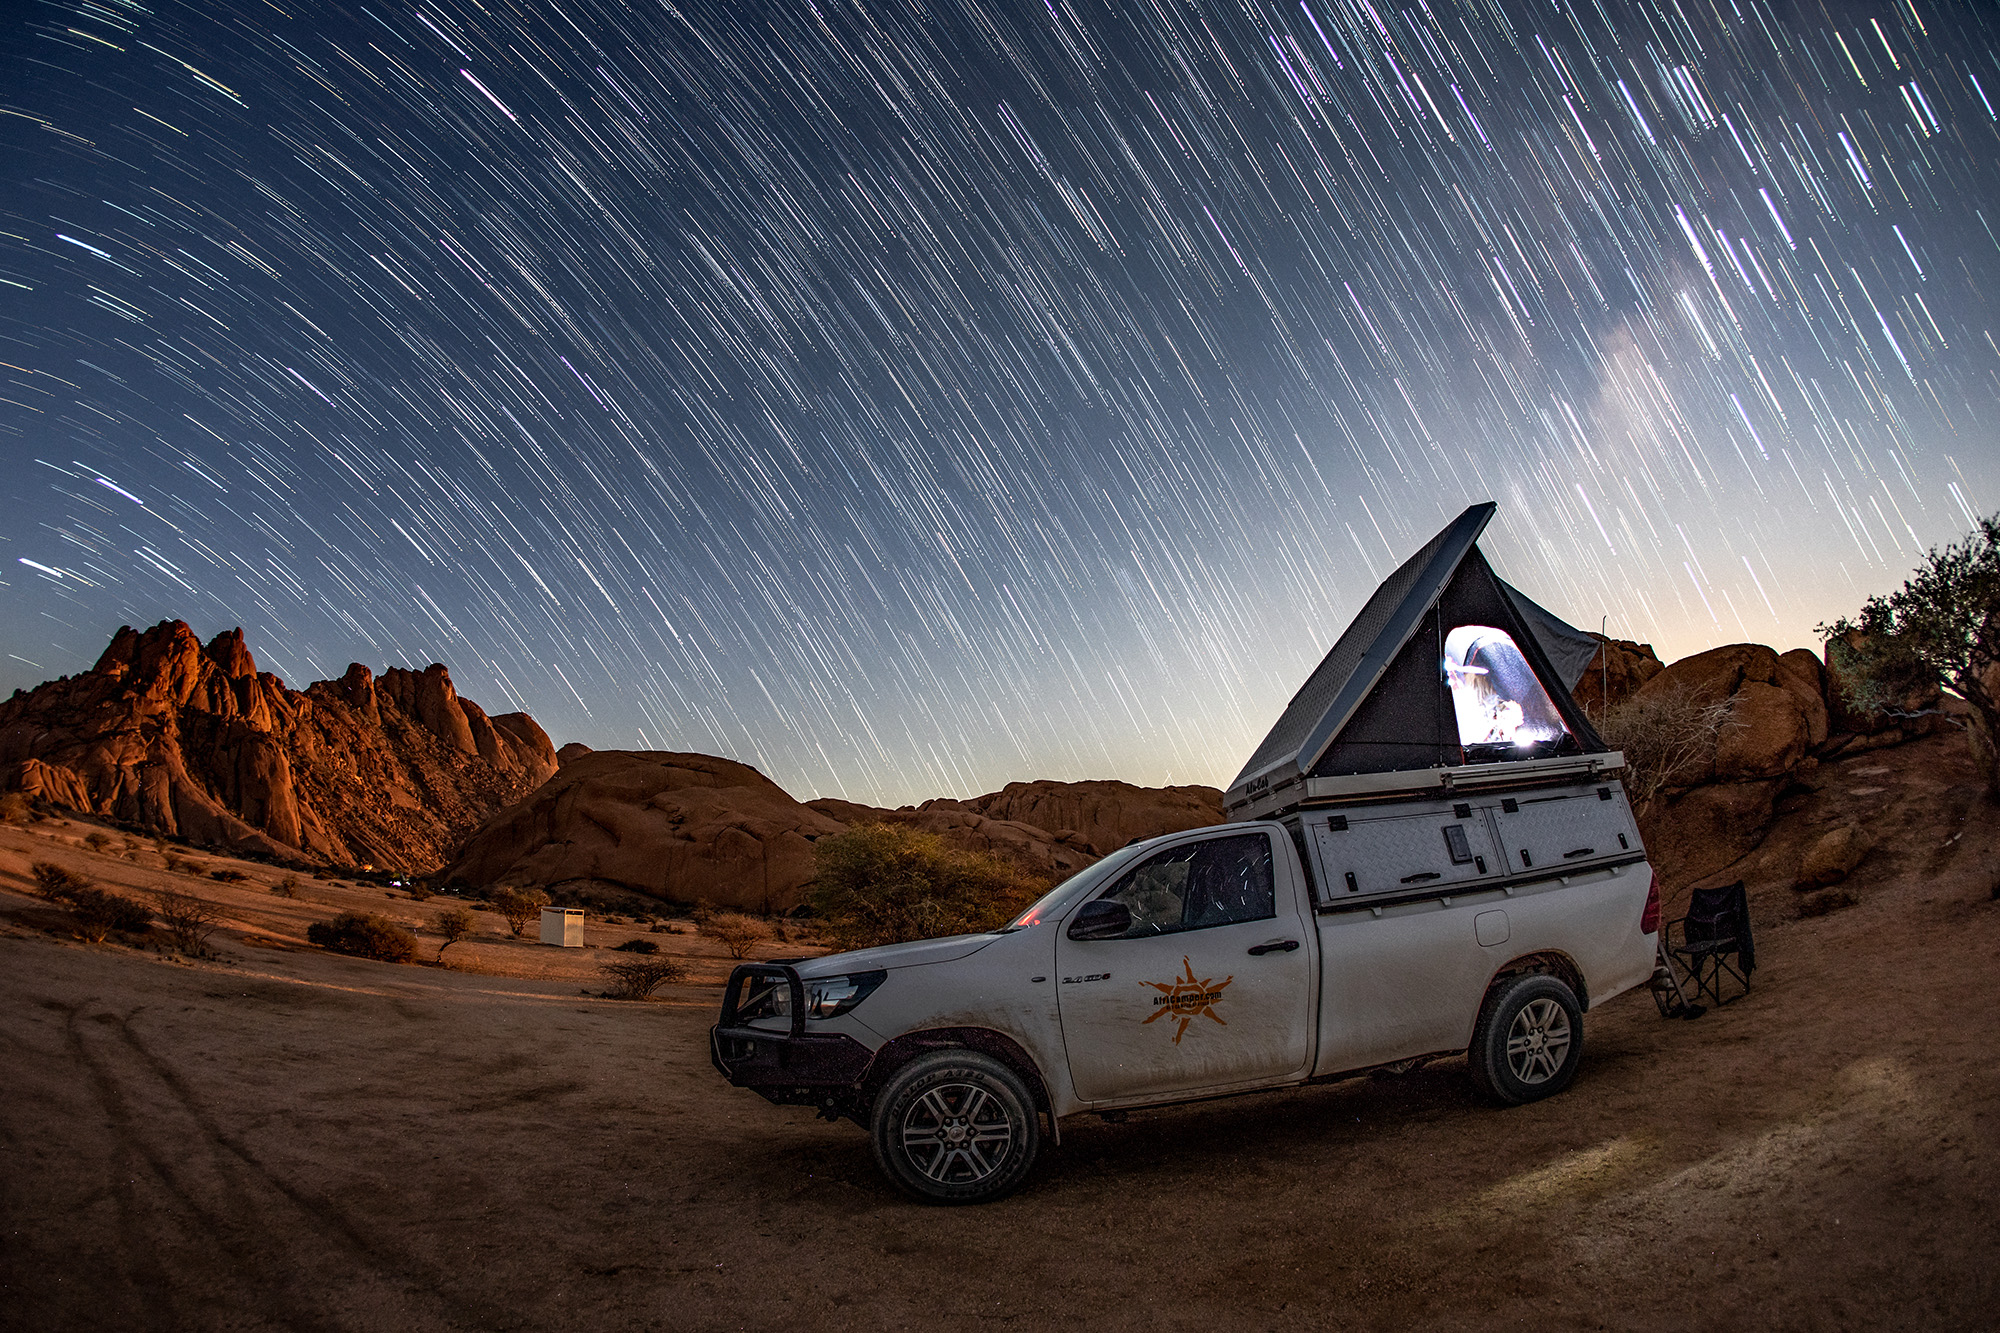 Star Trail Spitzkoppe 2_LR_sml.jpg